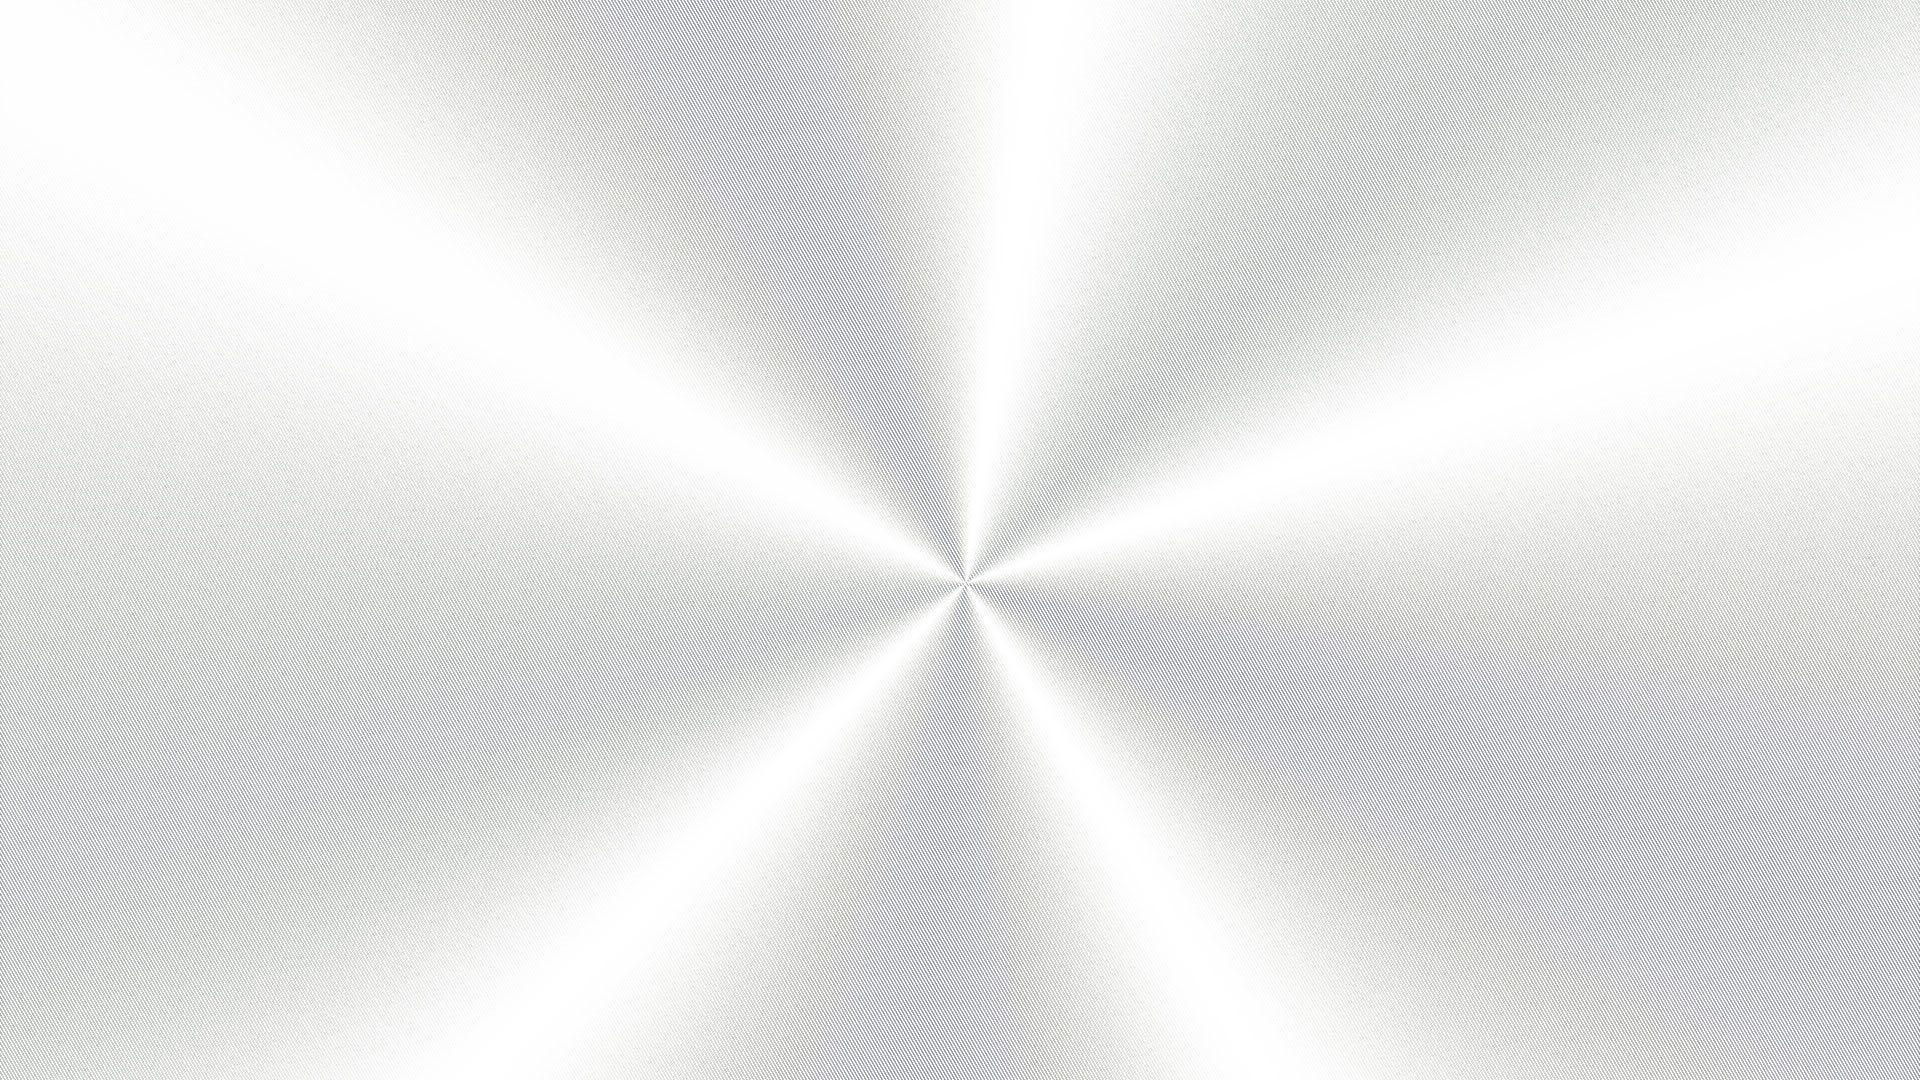 Silver desktop wallpaper download